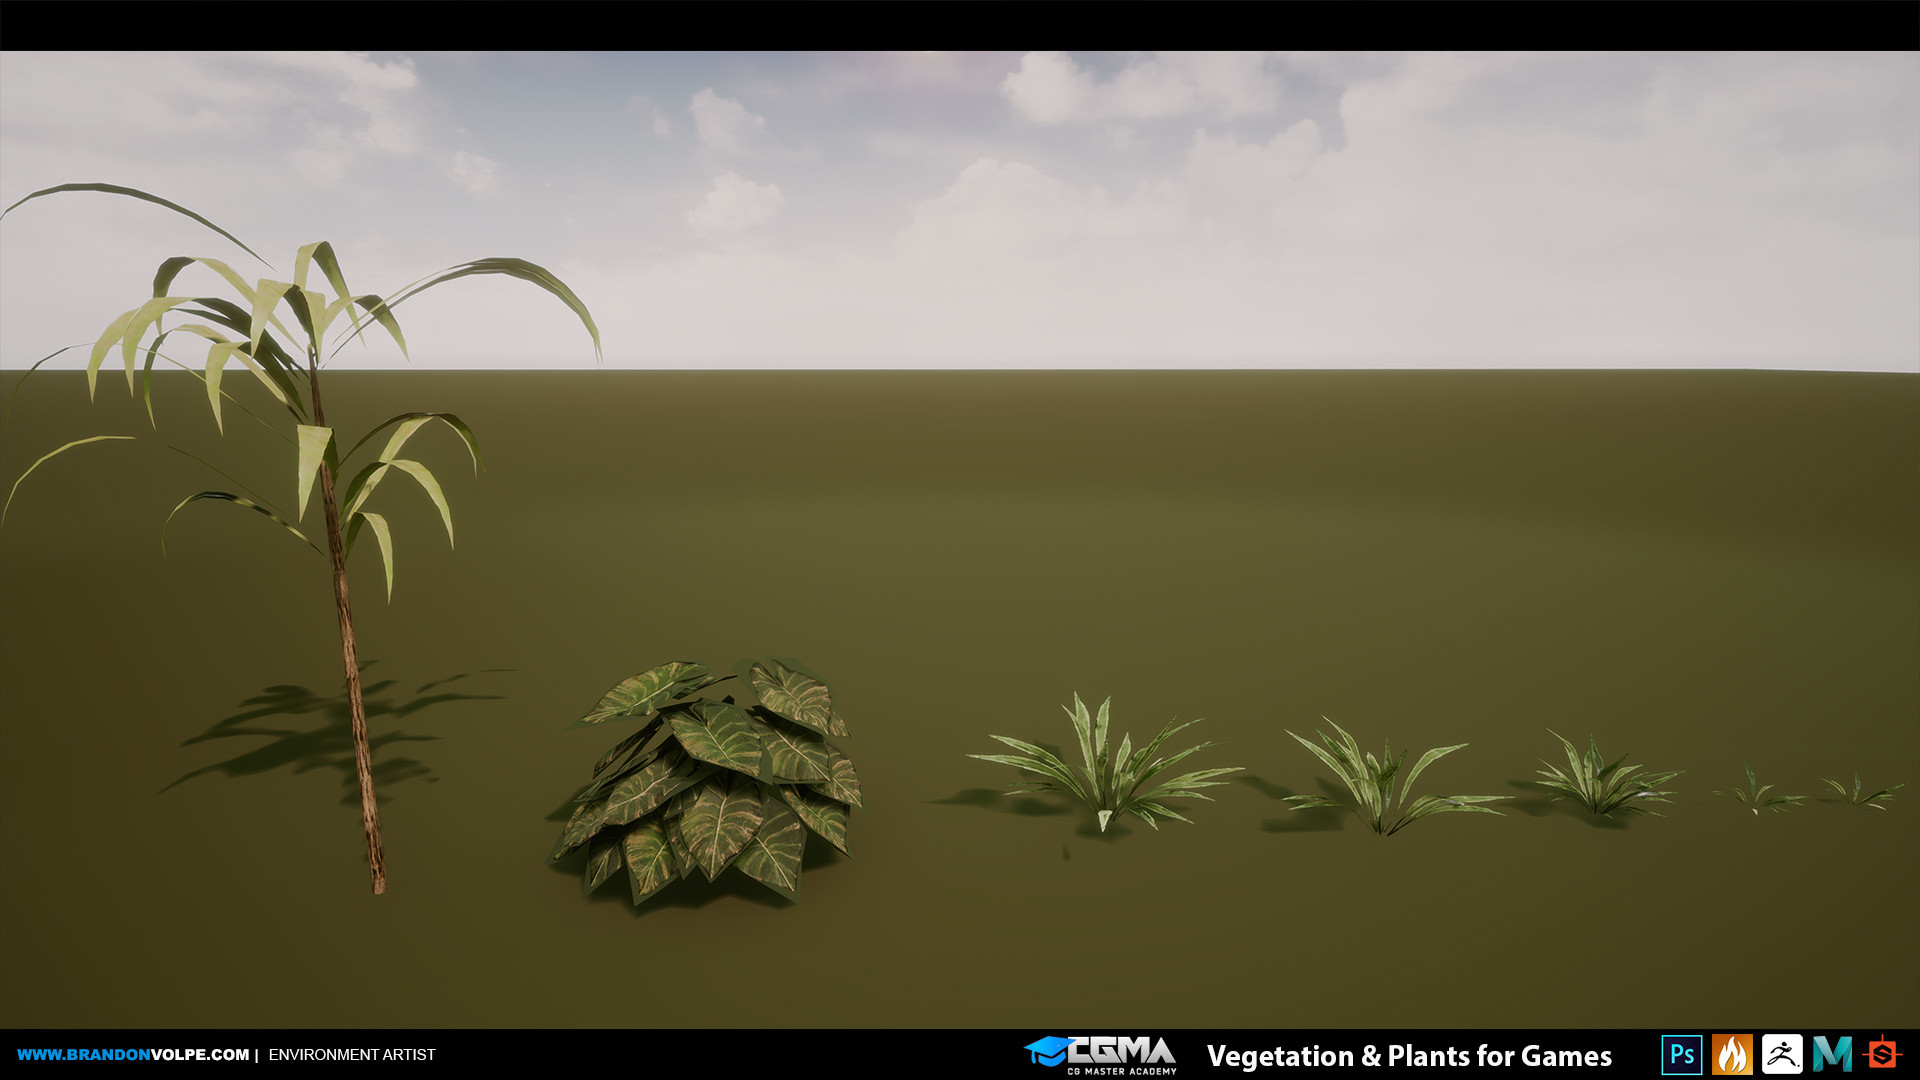 Brandon volpe brandonvolpe cgma vegplants 014